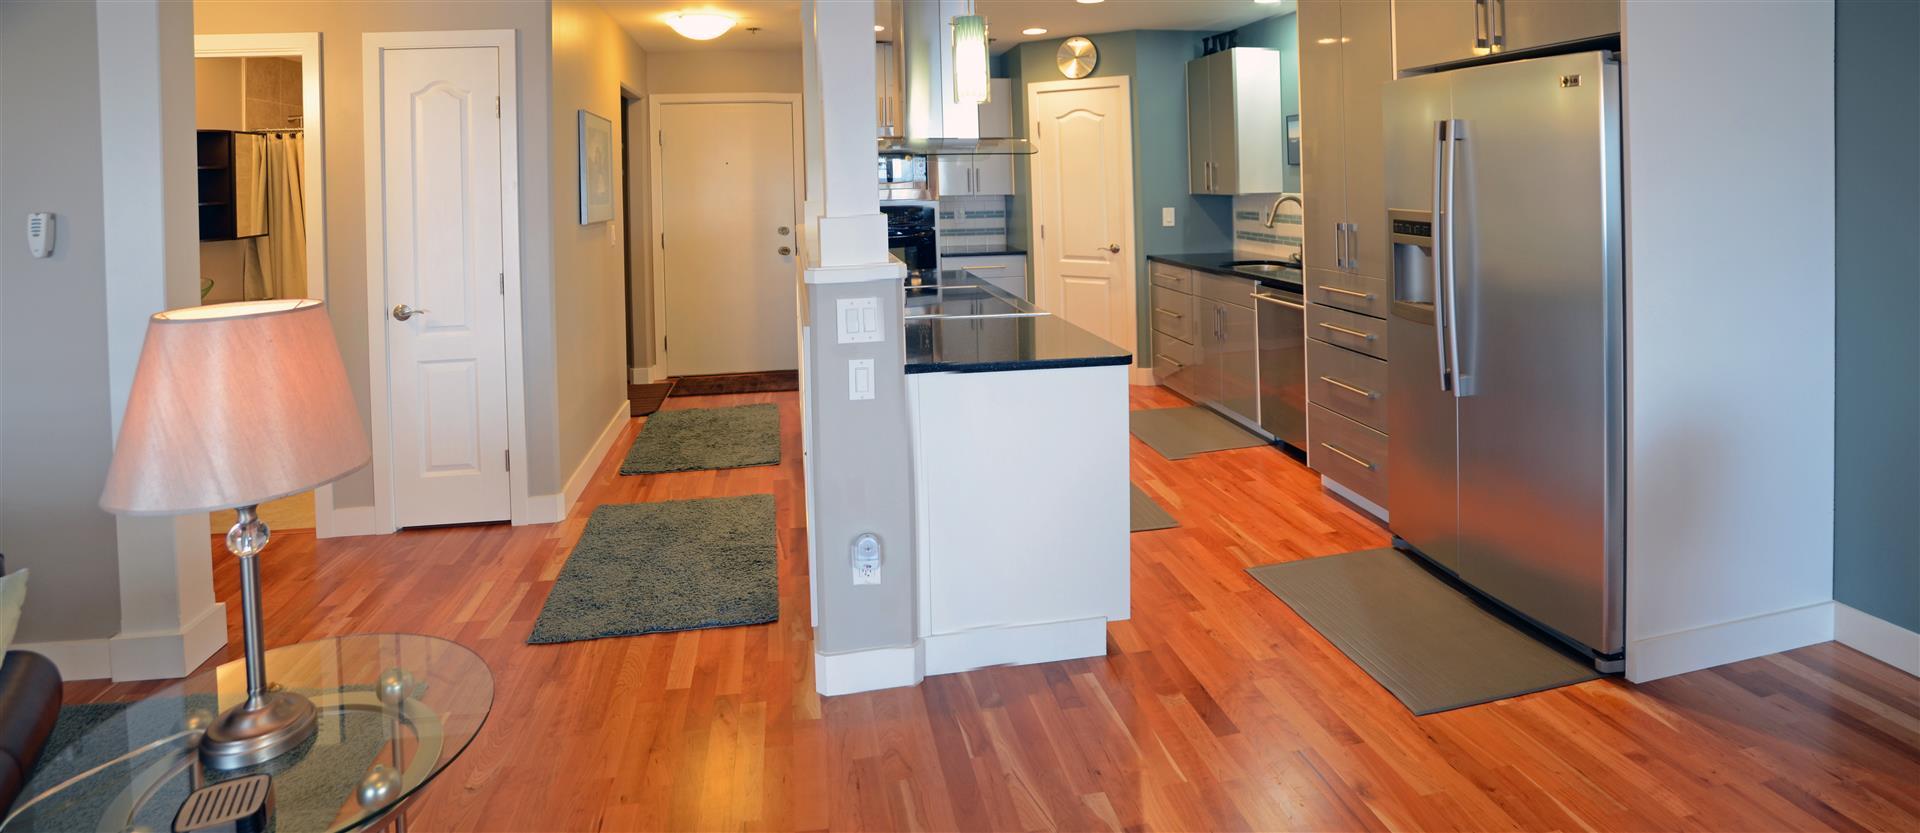 Kitchen & Hall